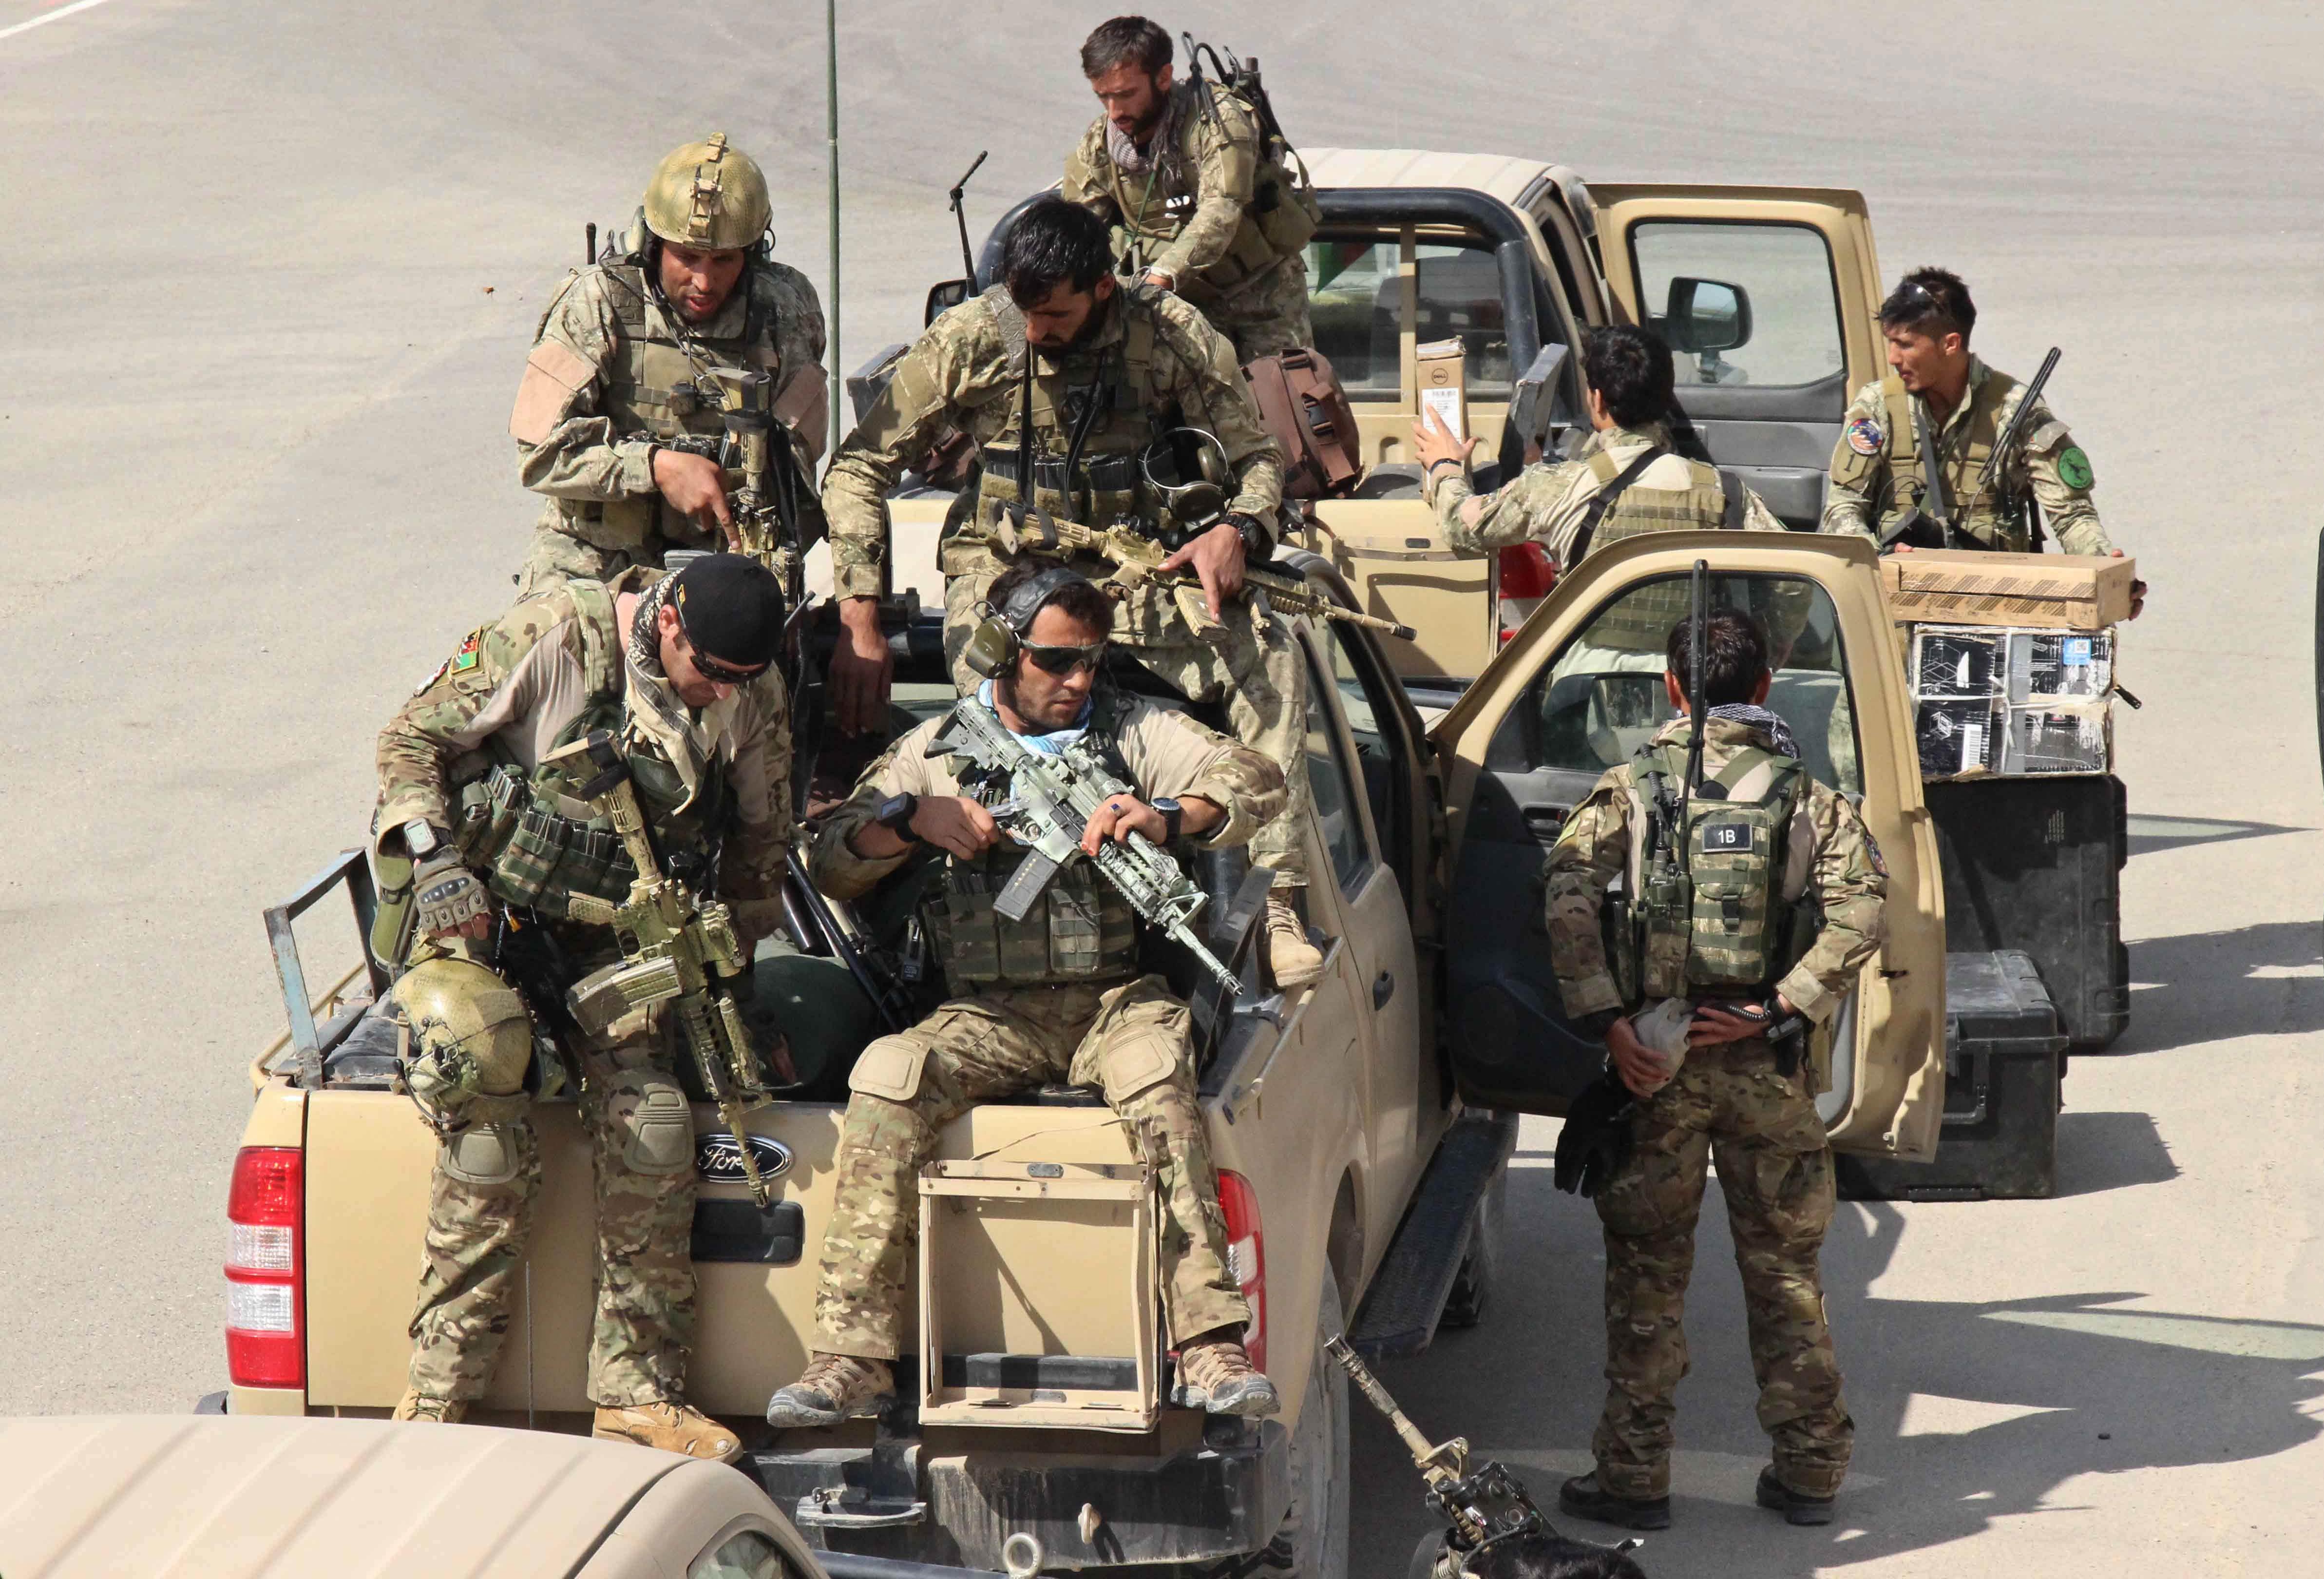 Afghan security forces in Kunduz